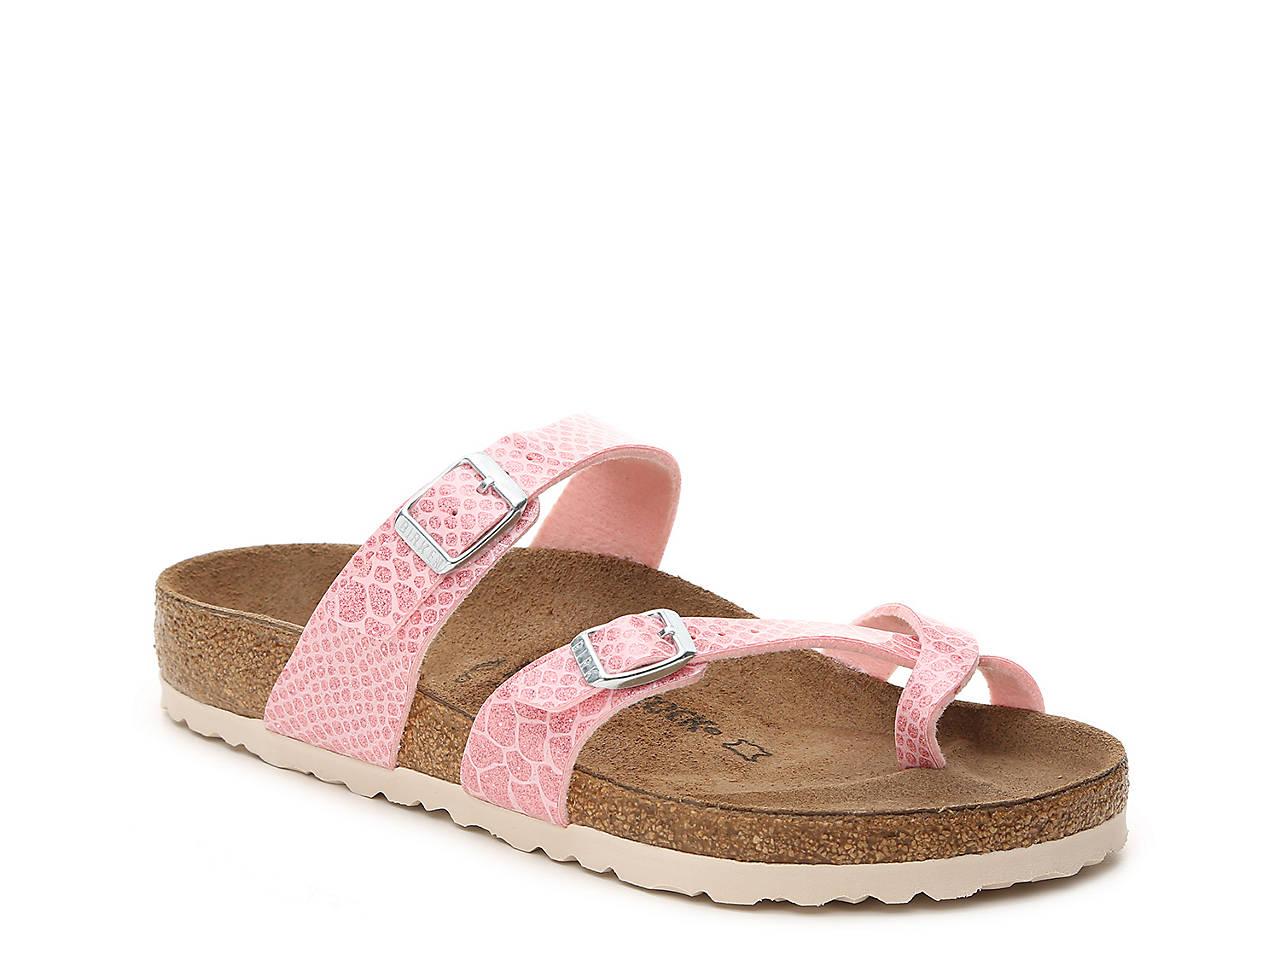 c1a05a2bbccc Birkenstock Mayari Flat Sandal - Women s Women s Shoes